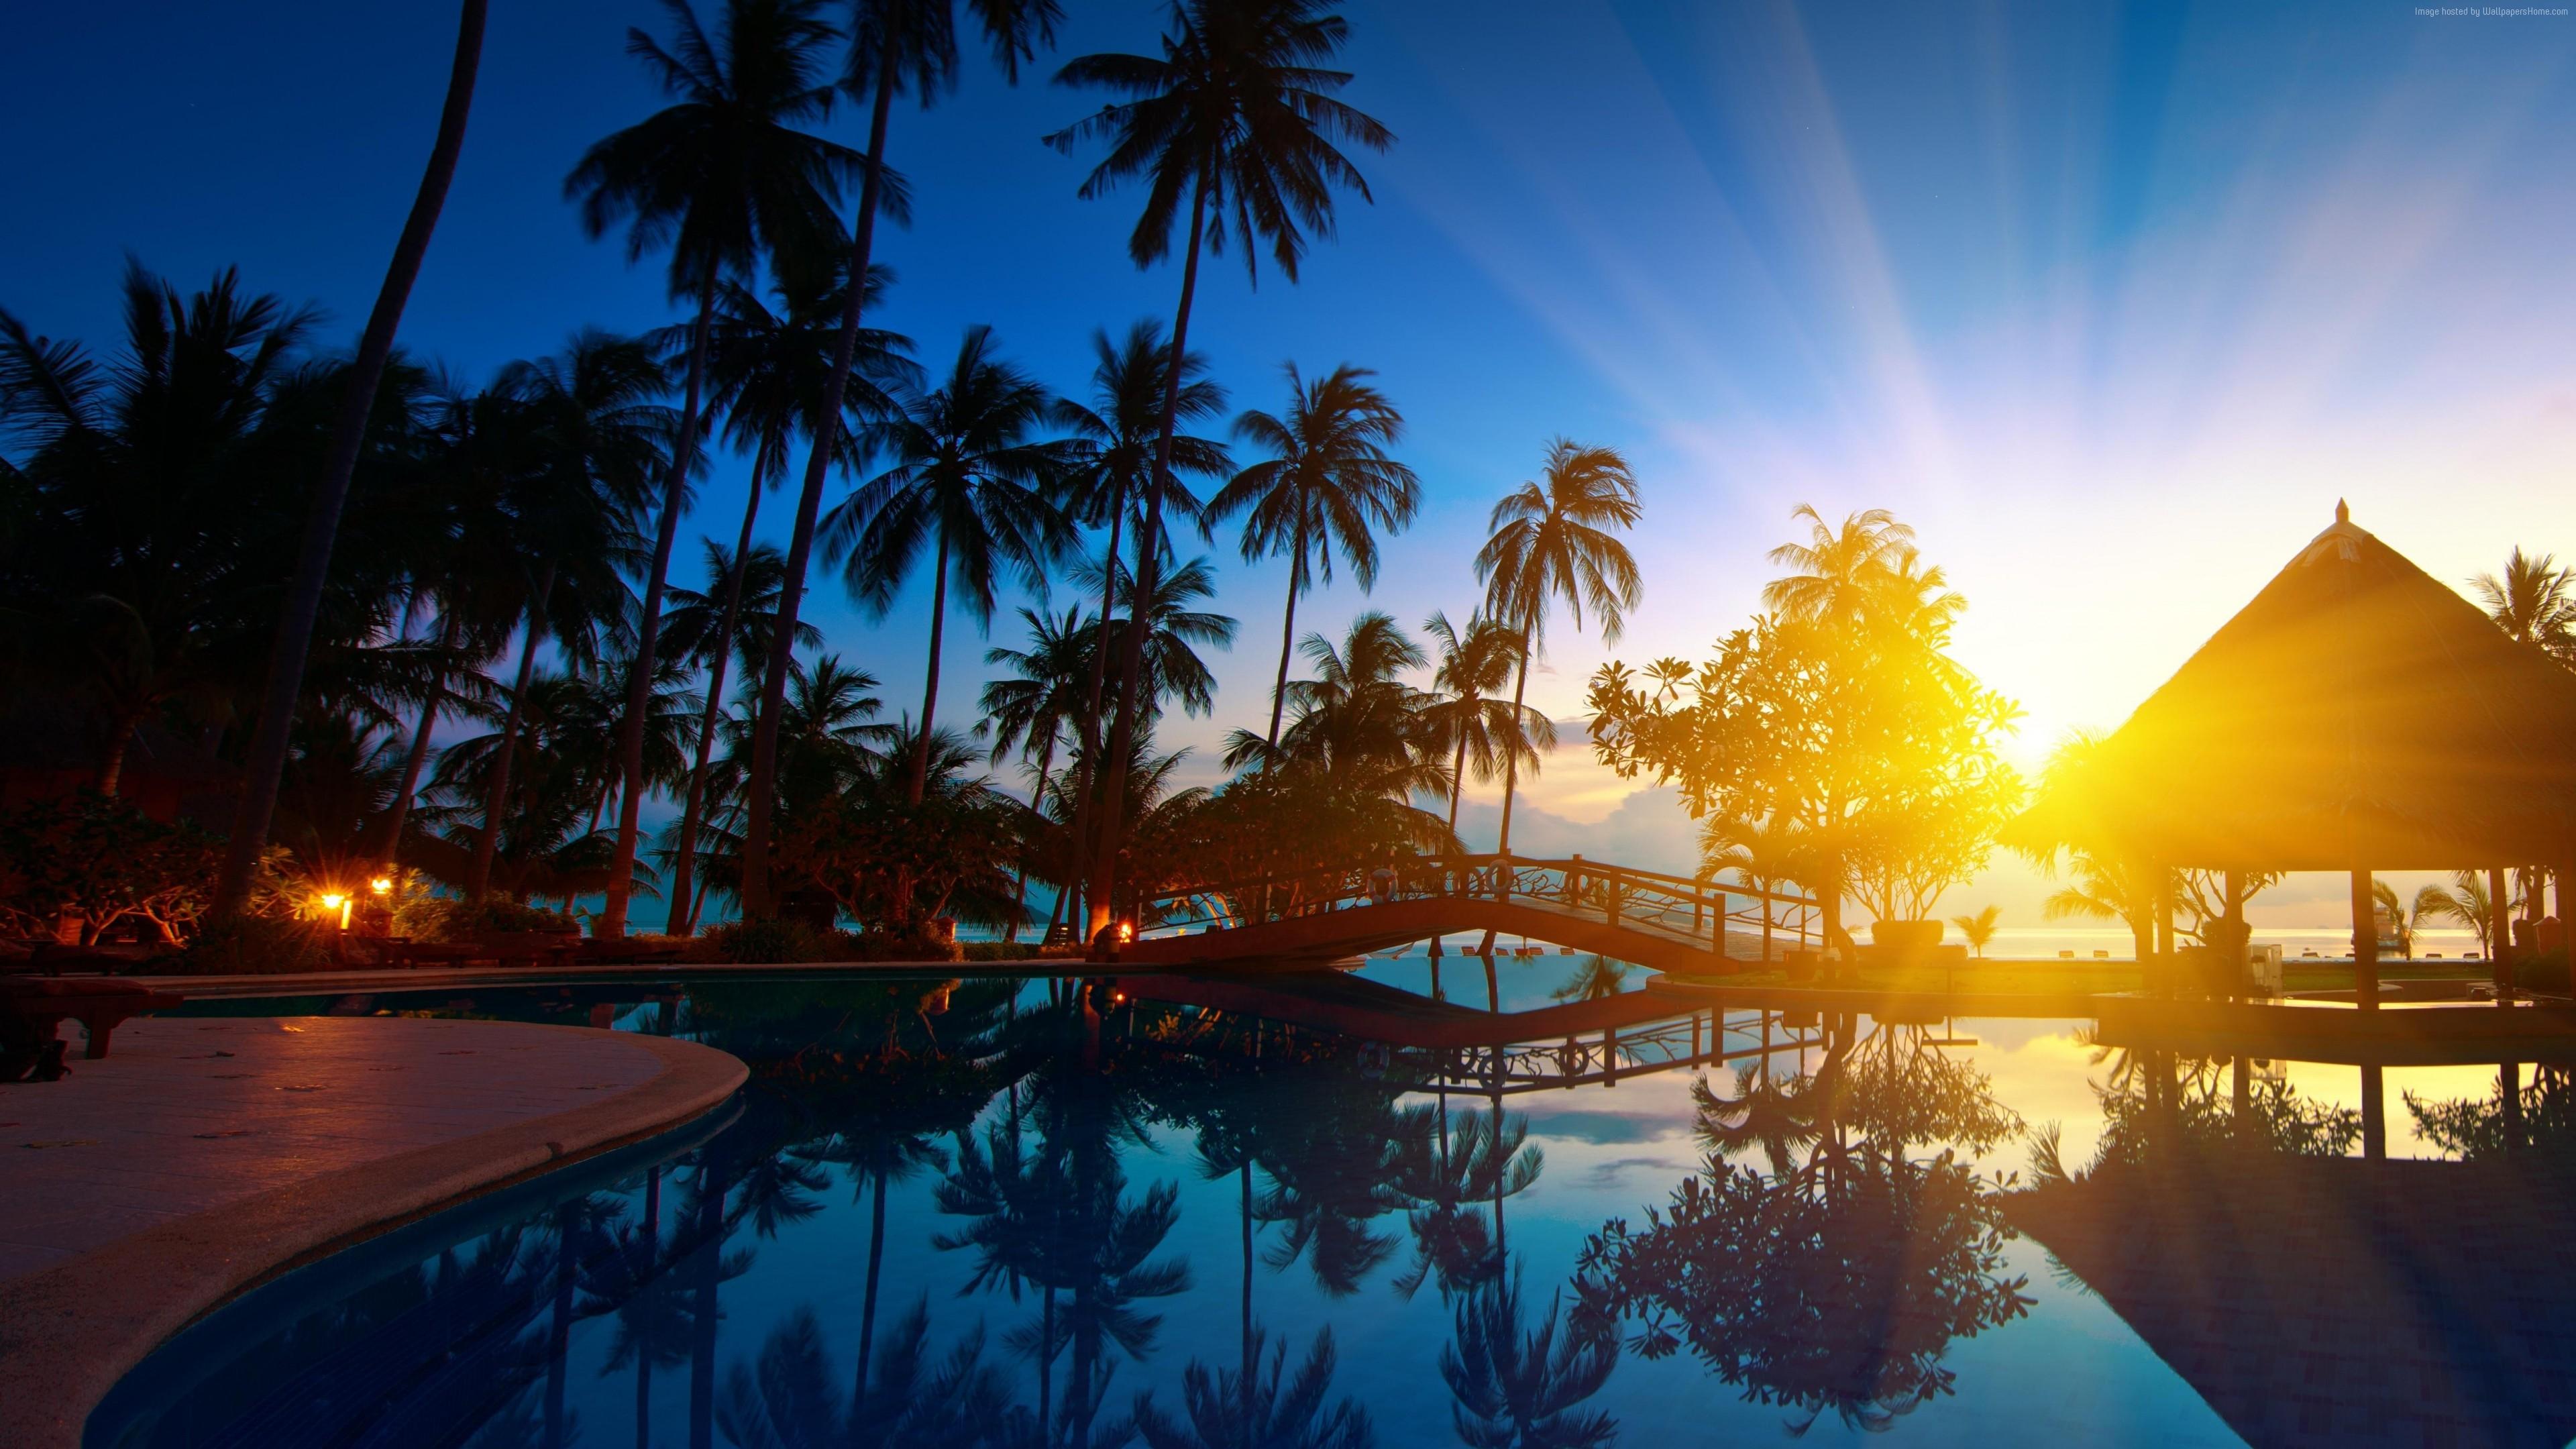 Wallpaper Thailand hotel ocean beach vacation 5k 4k Travel 3840x2160